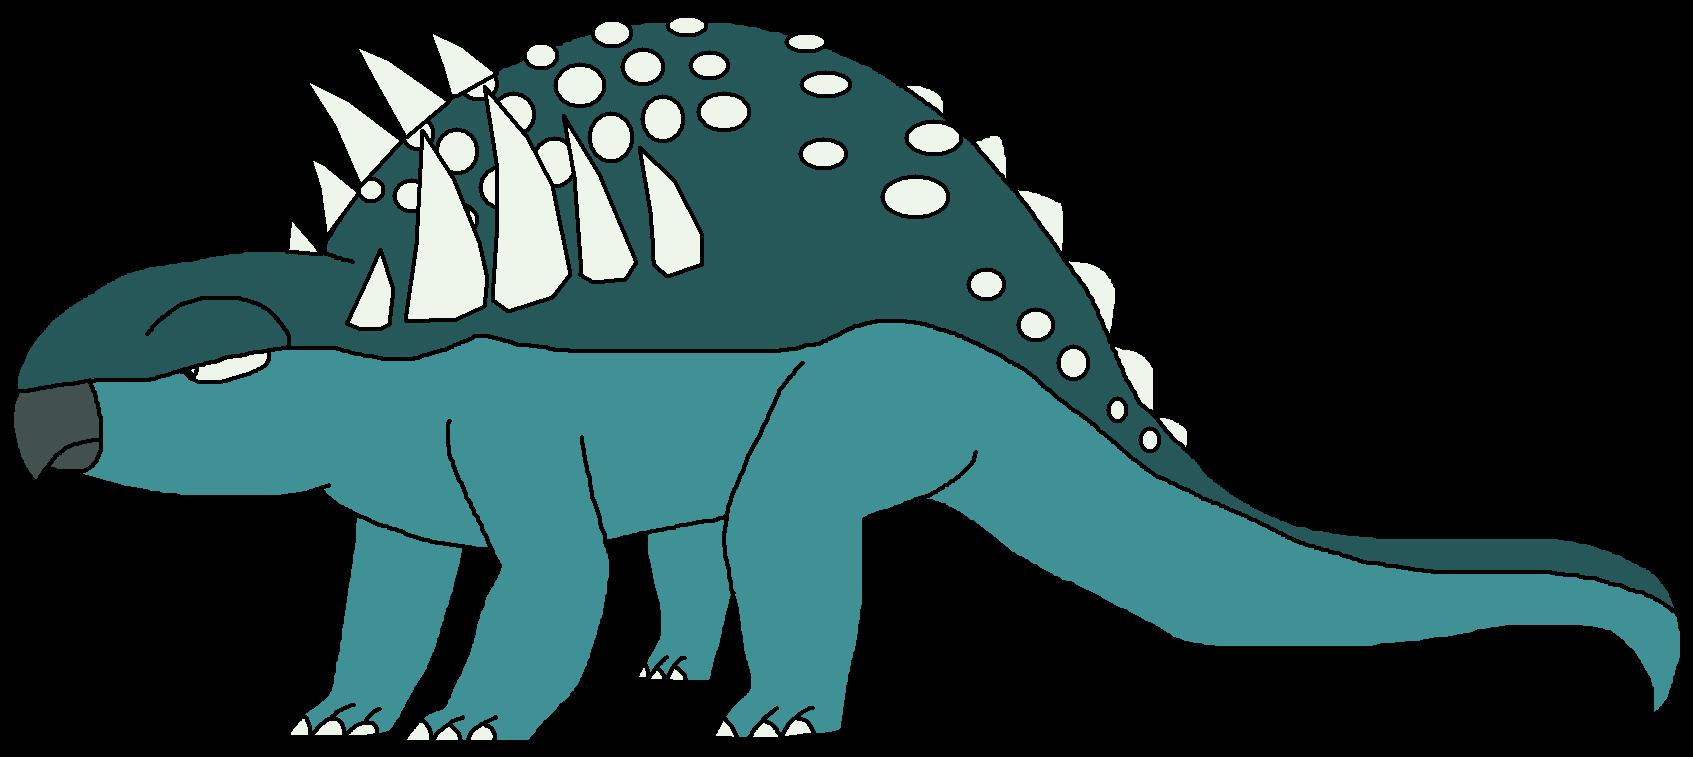 Acanthopholis pedia wikia fandom. Fossil clipart dinosaur dig